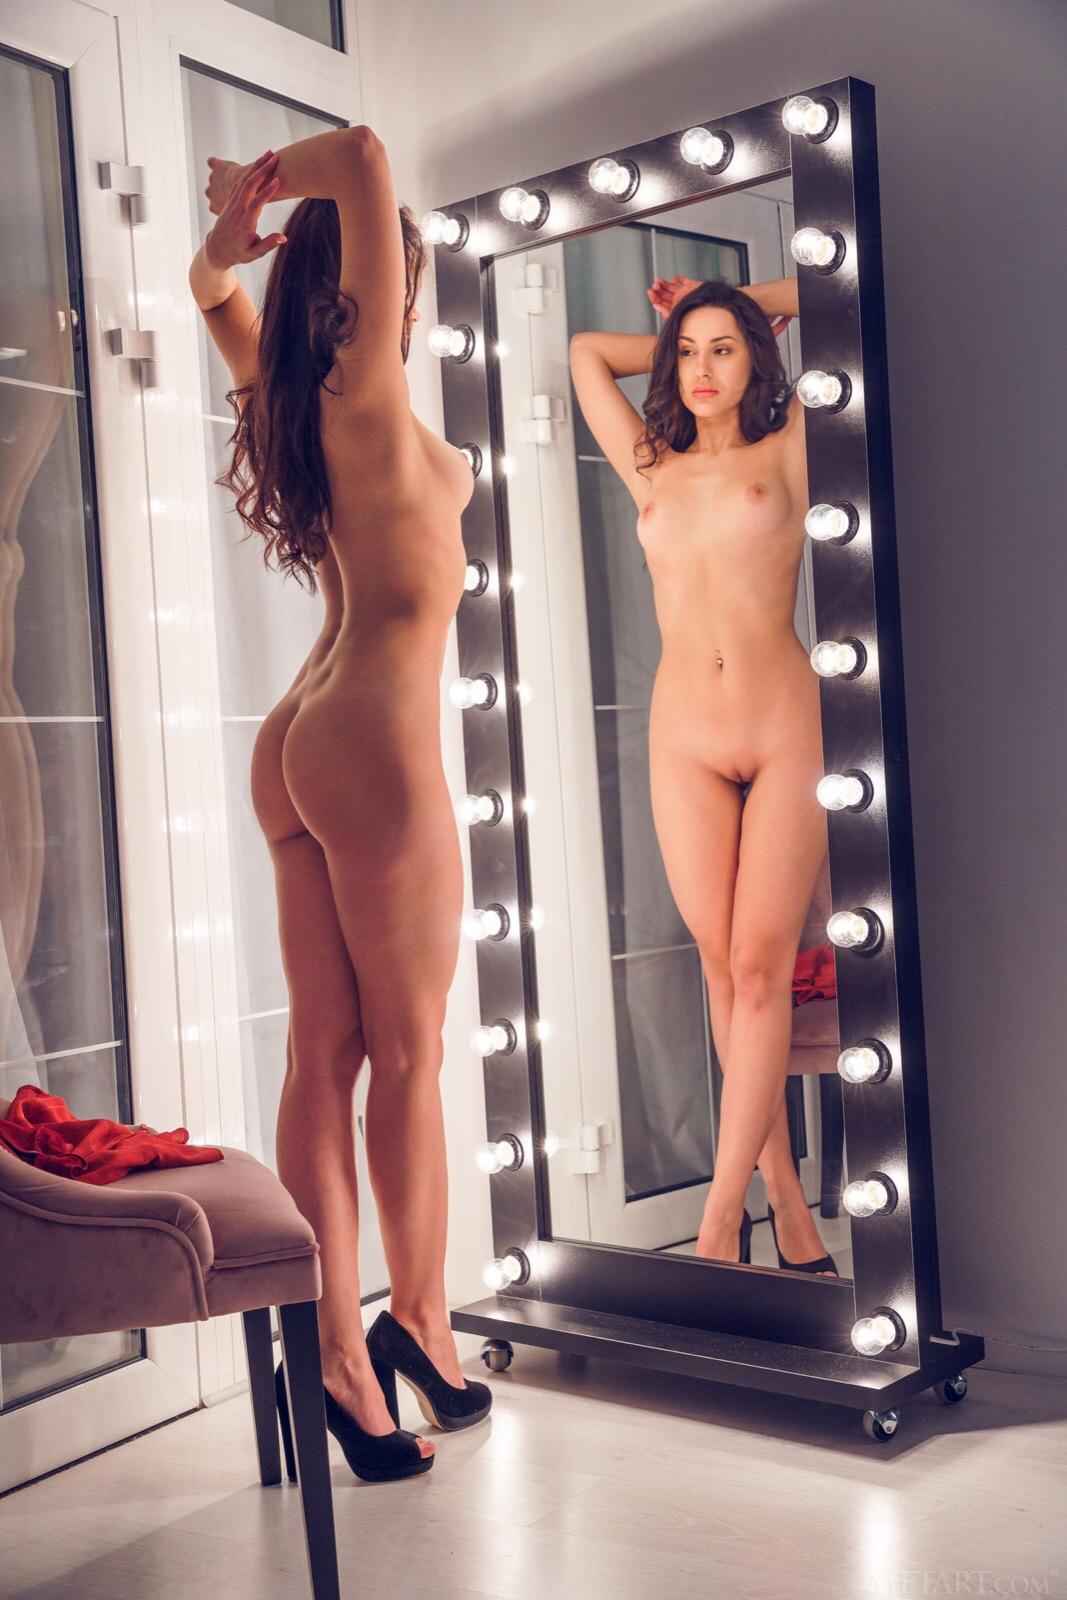 girls-naked-high-heels-pussy-mix-vol2-39